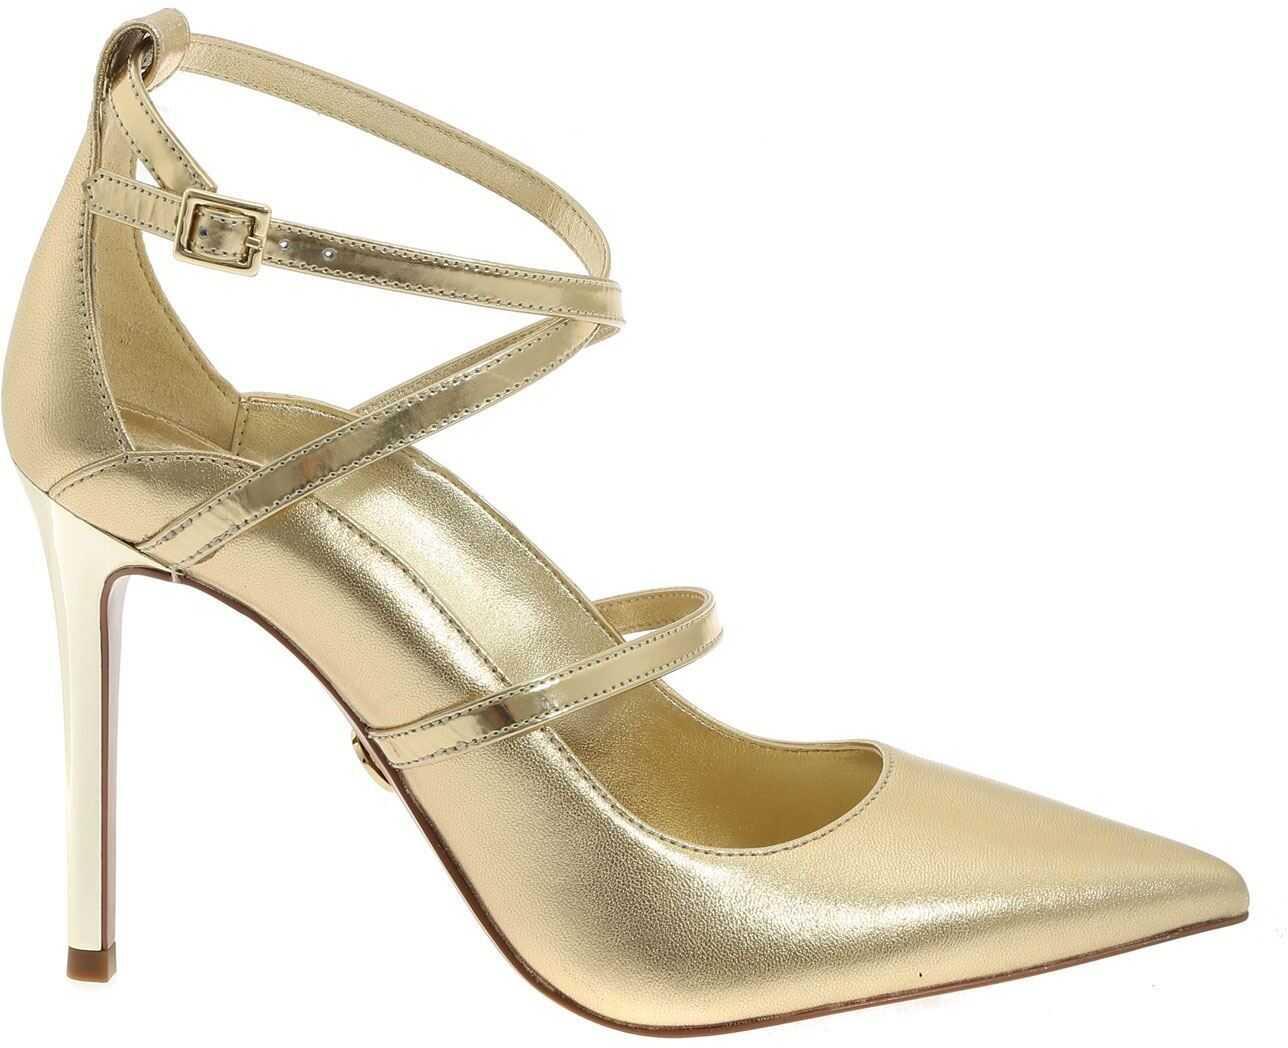 Michael Kors Pumps Geneve In Gold Color Gold